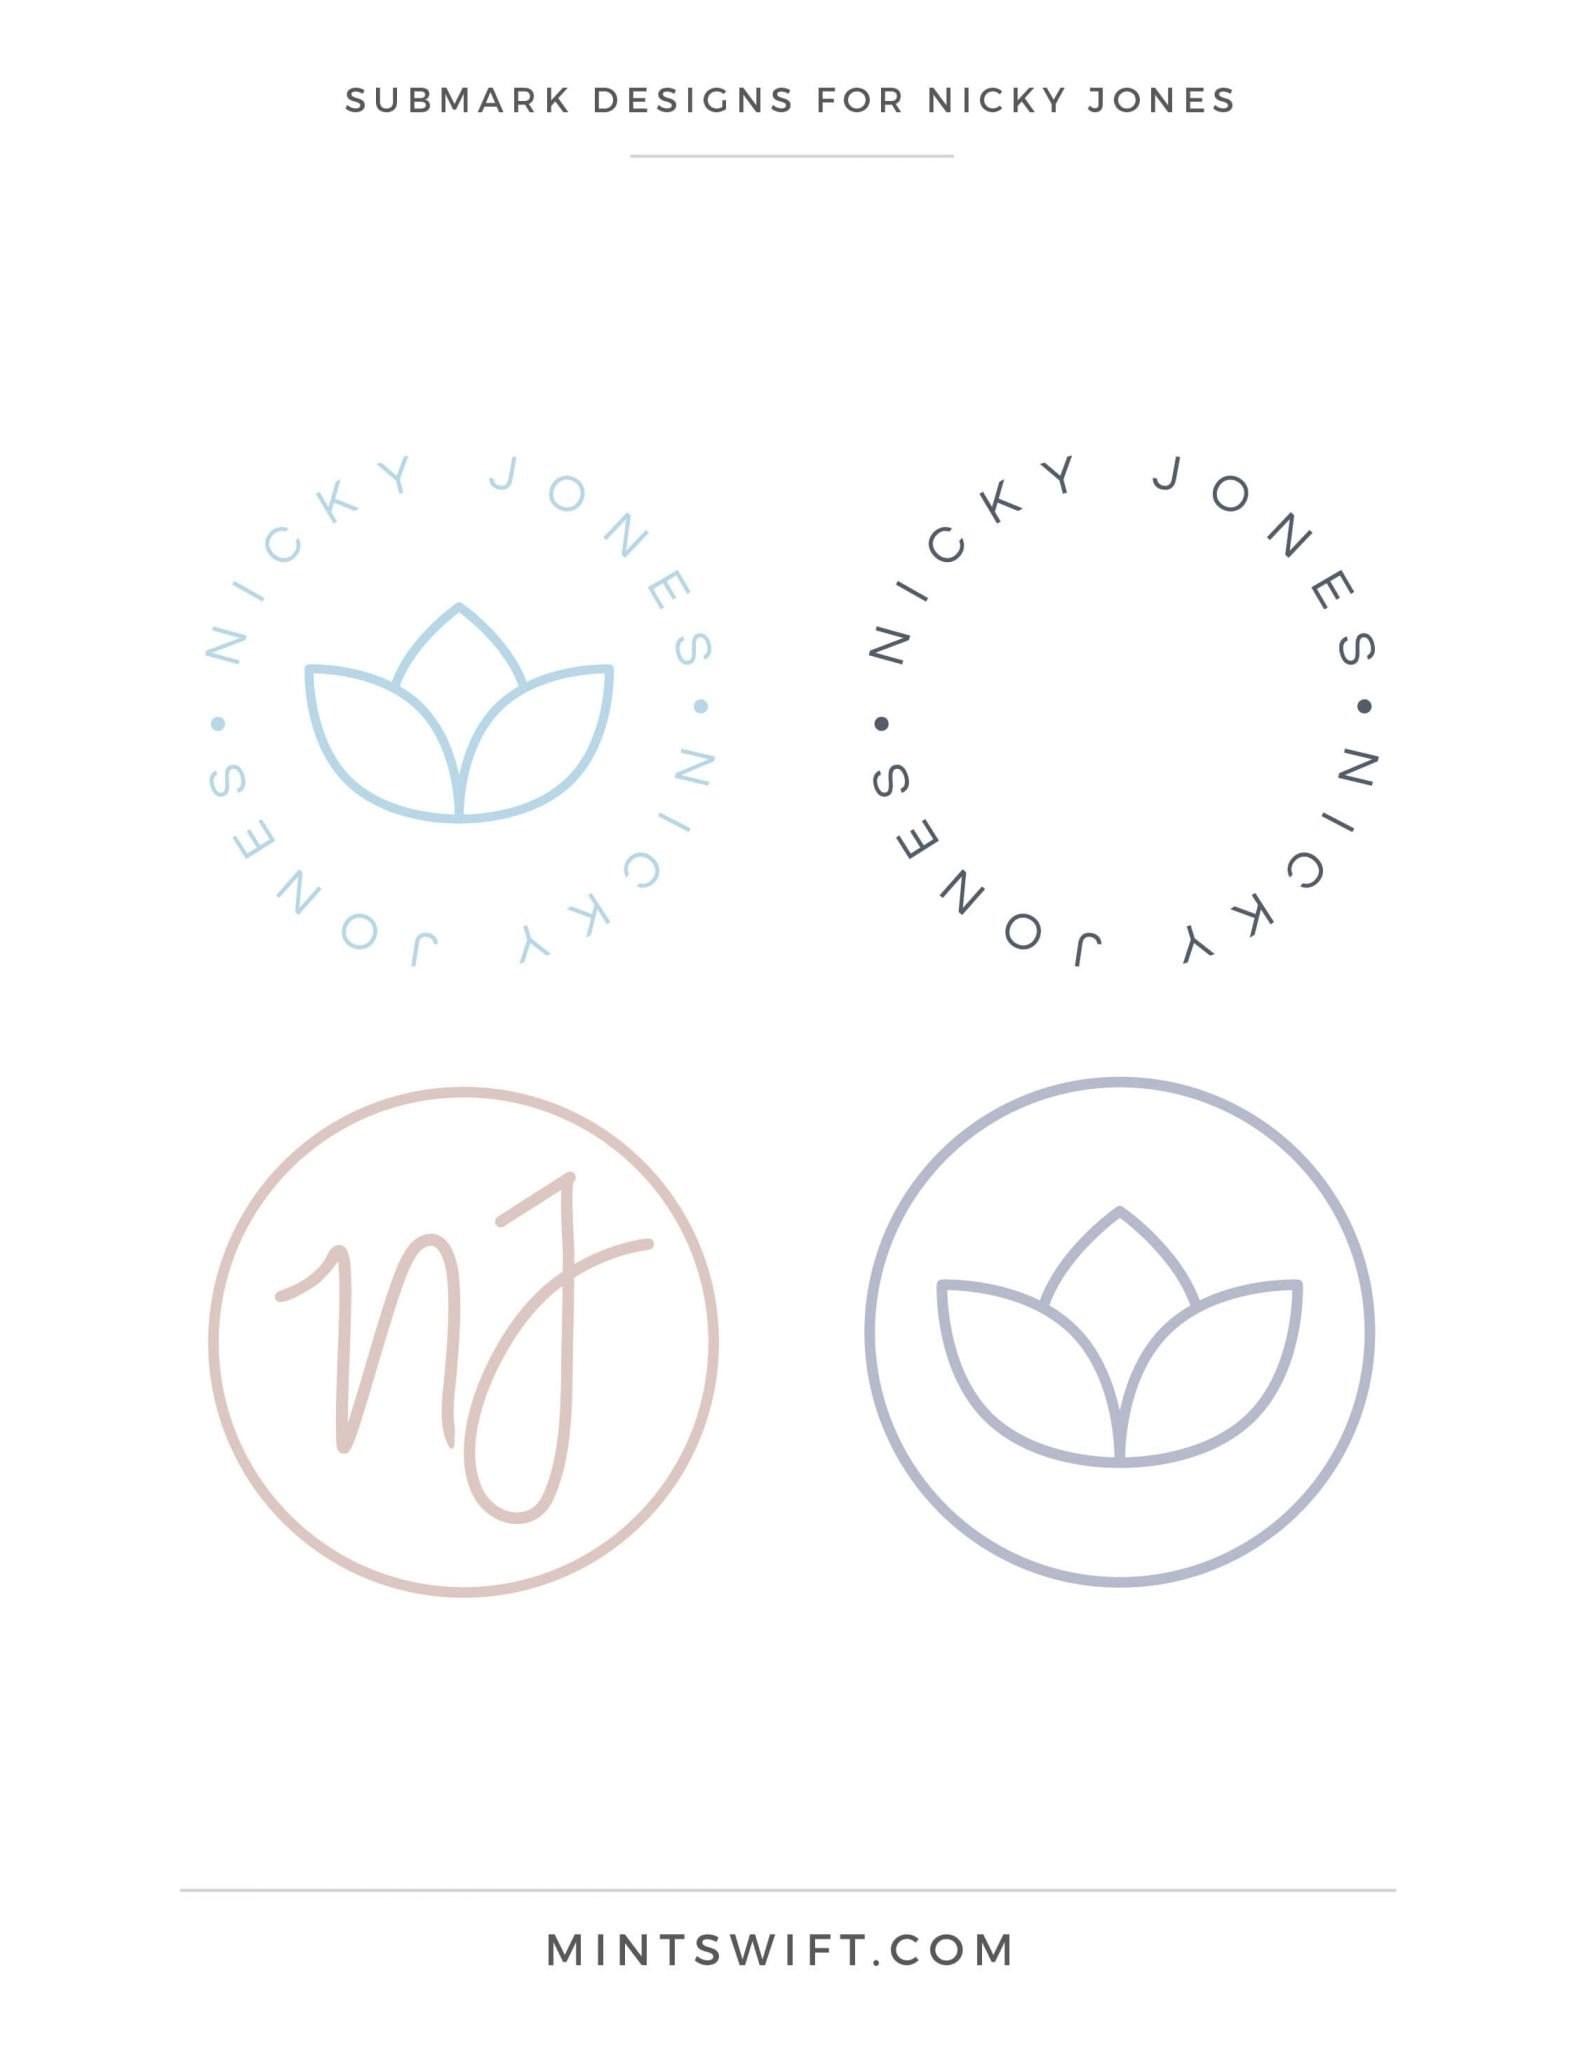 Nicky Jones - Submark Designs - Brand Design Package - MintSwift